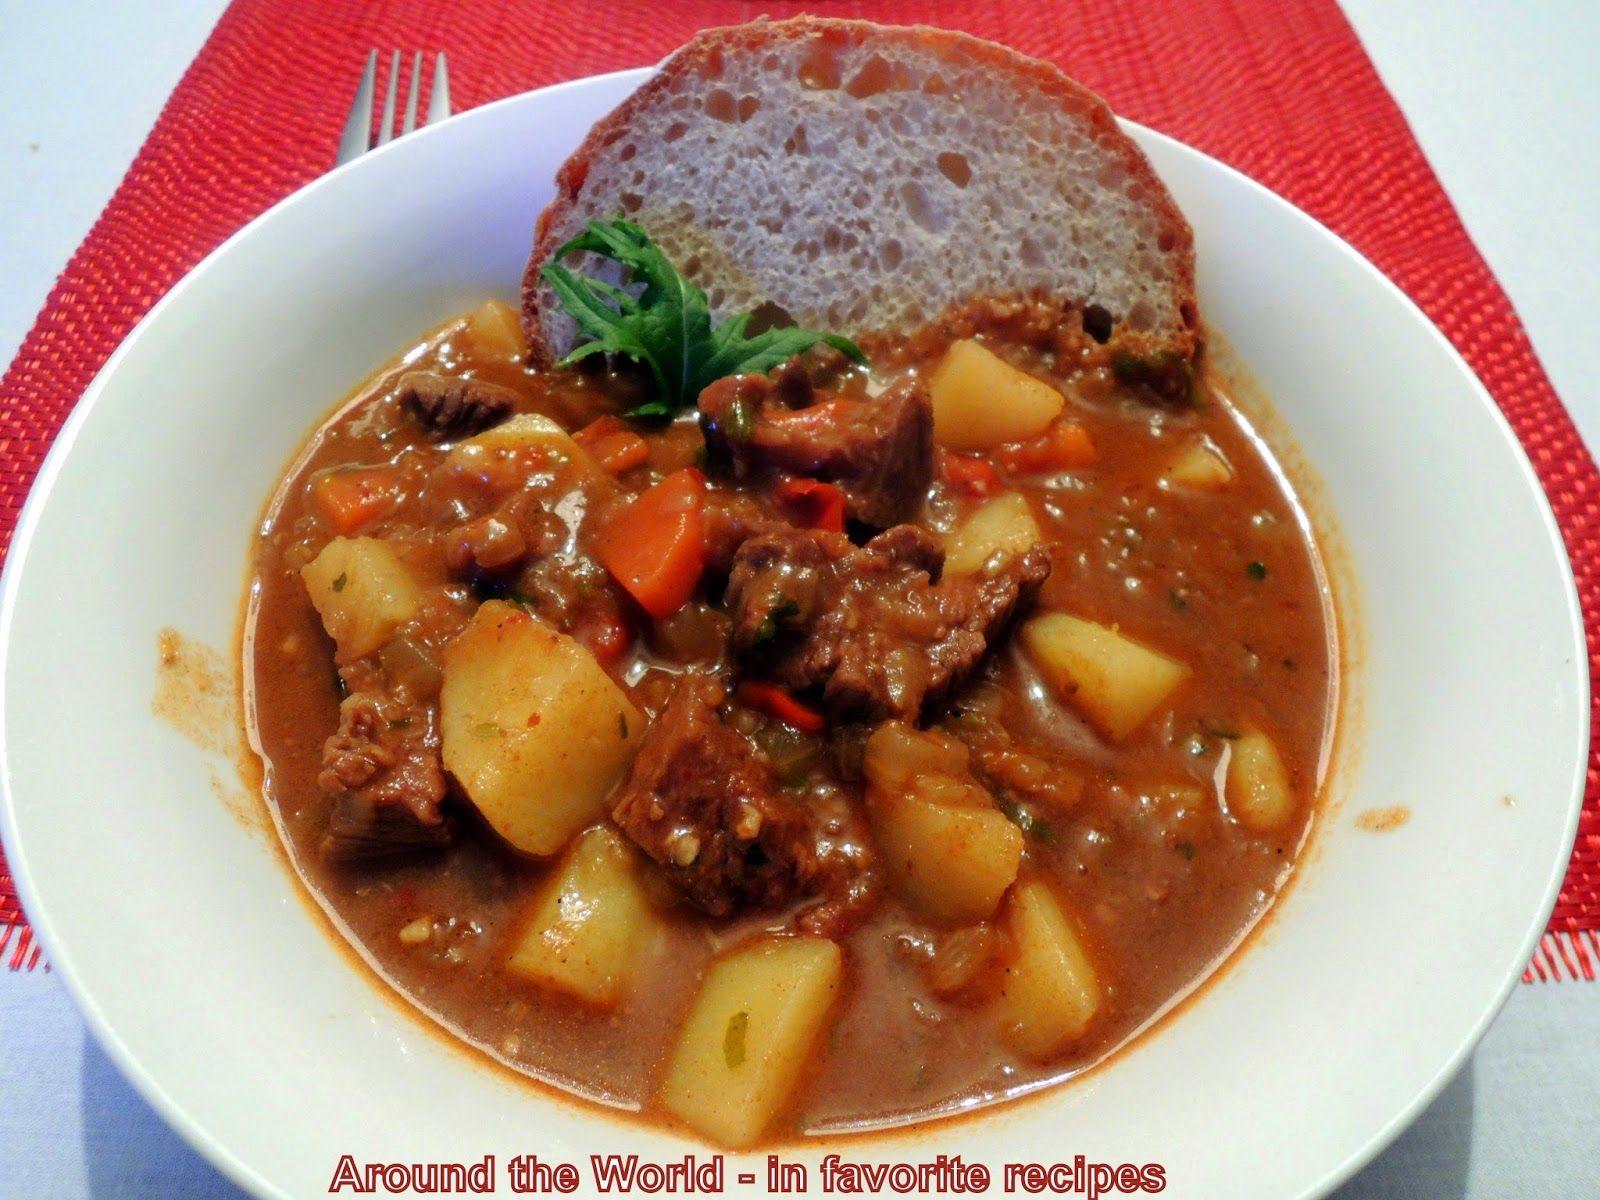 Hungarian goulash slovenian way blogs de recipes slovenian yummy hungarian goulash slovenian way blogs de recipes forumfinder Images